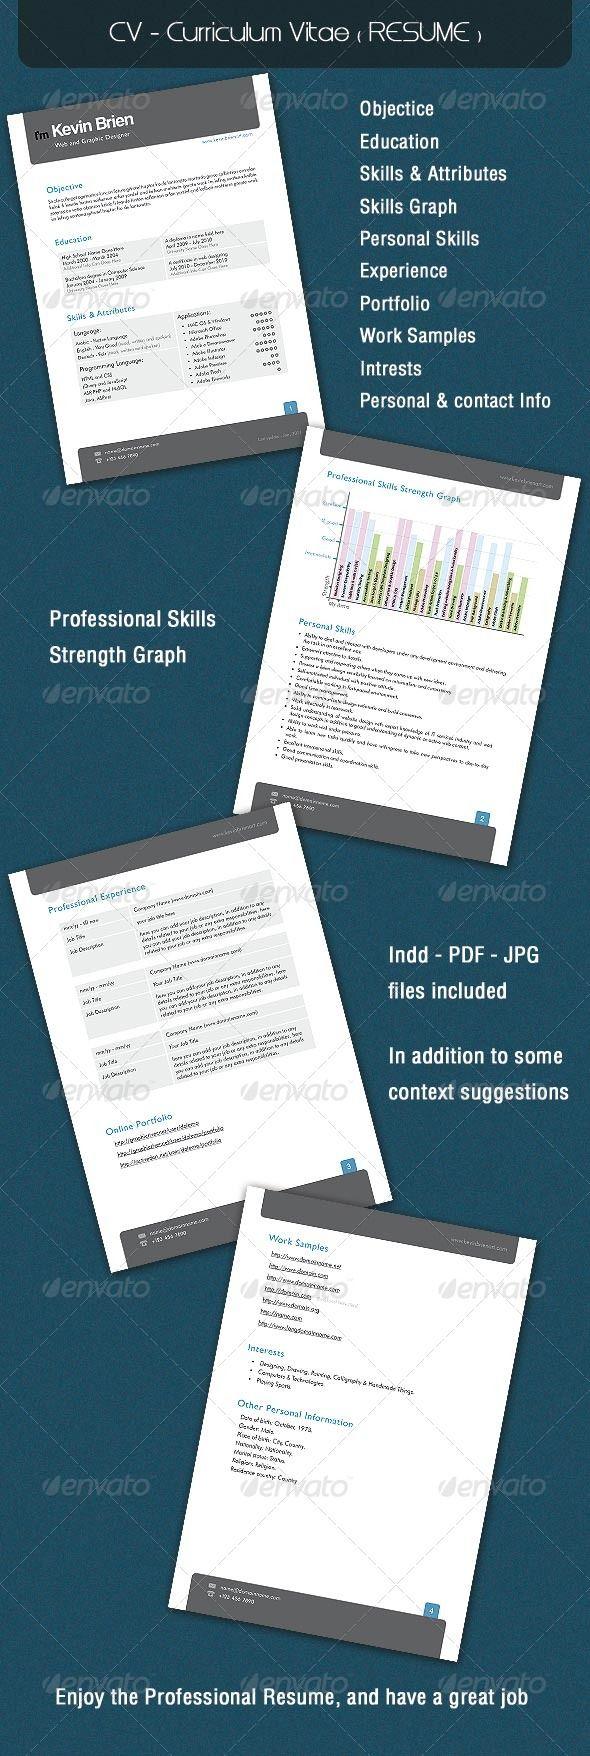 CV  Curriculum Vitae ( RESUME ) — InDesign INDD #portfolio #profile • Available here → https://graphicriver.net/item/cv-curriculum-vitae-resume-/143808?ref=pxcr